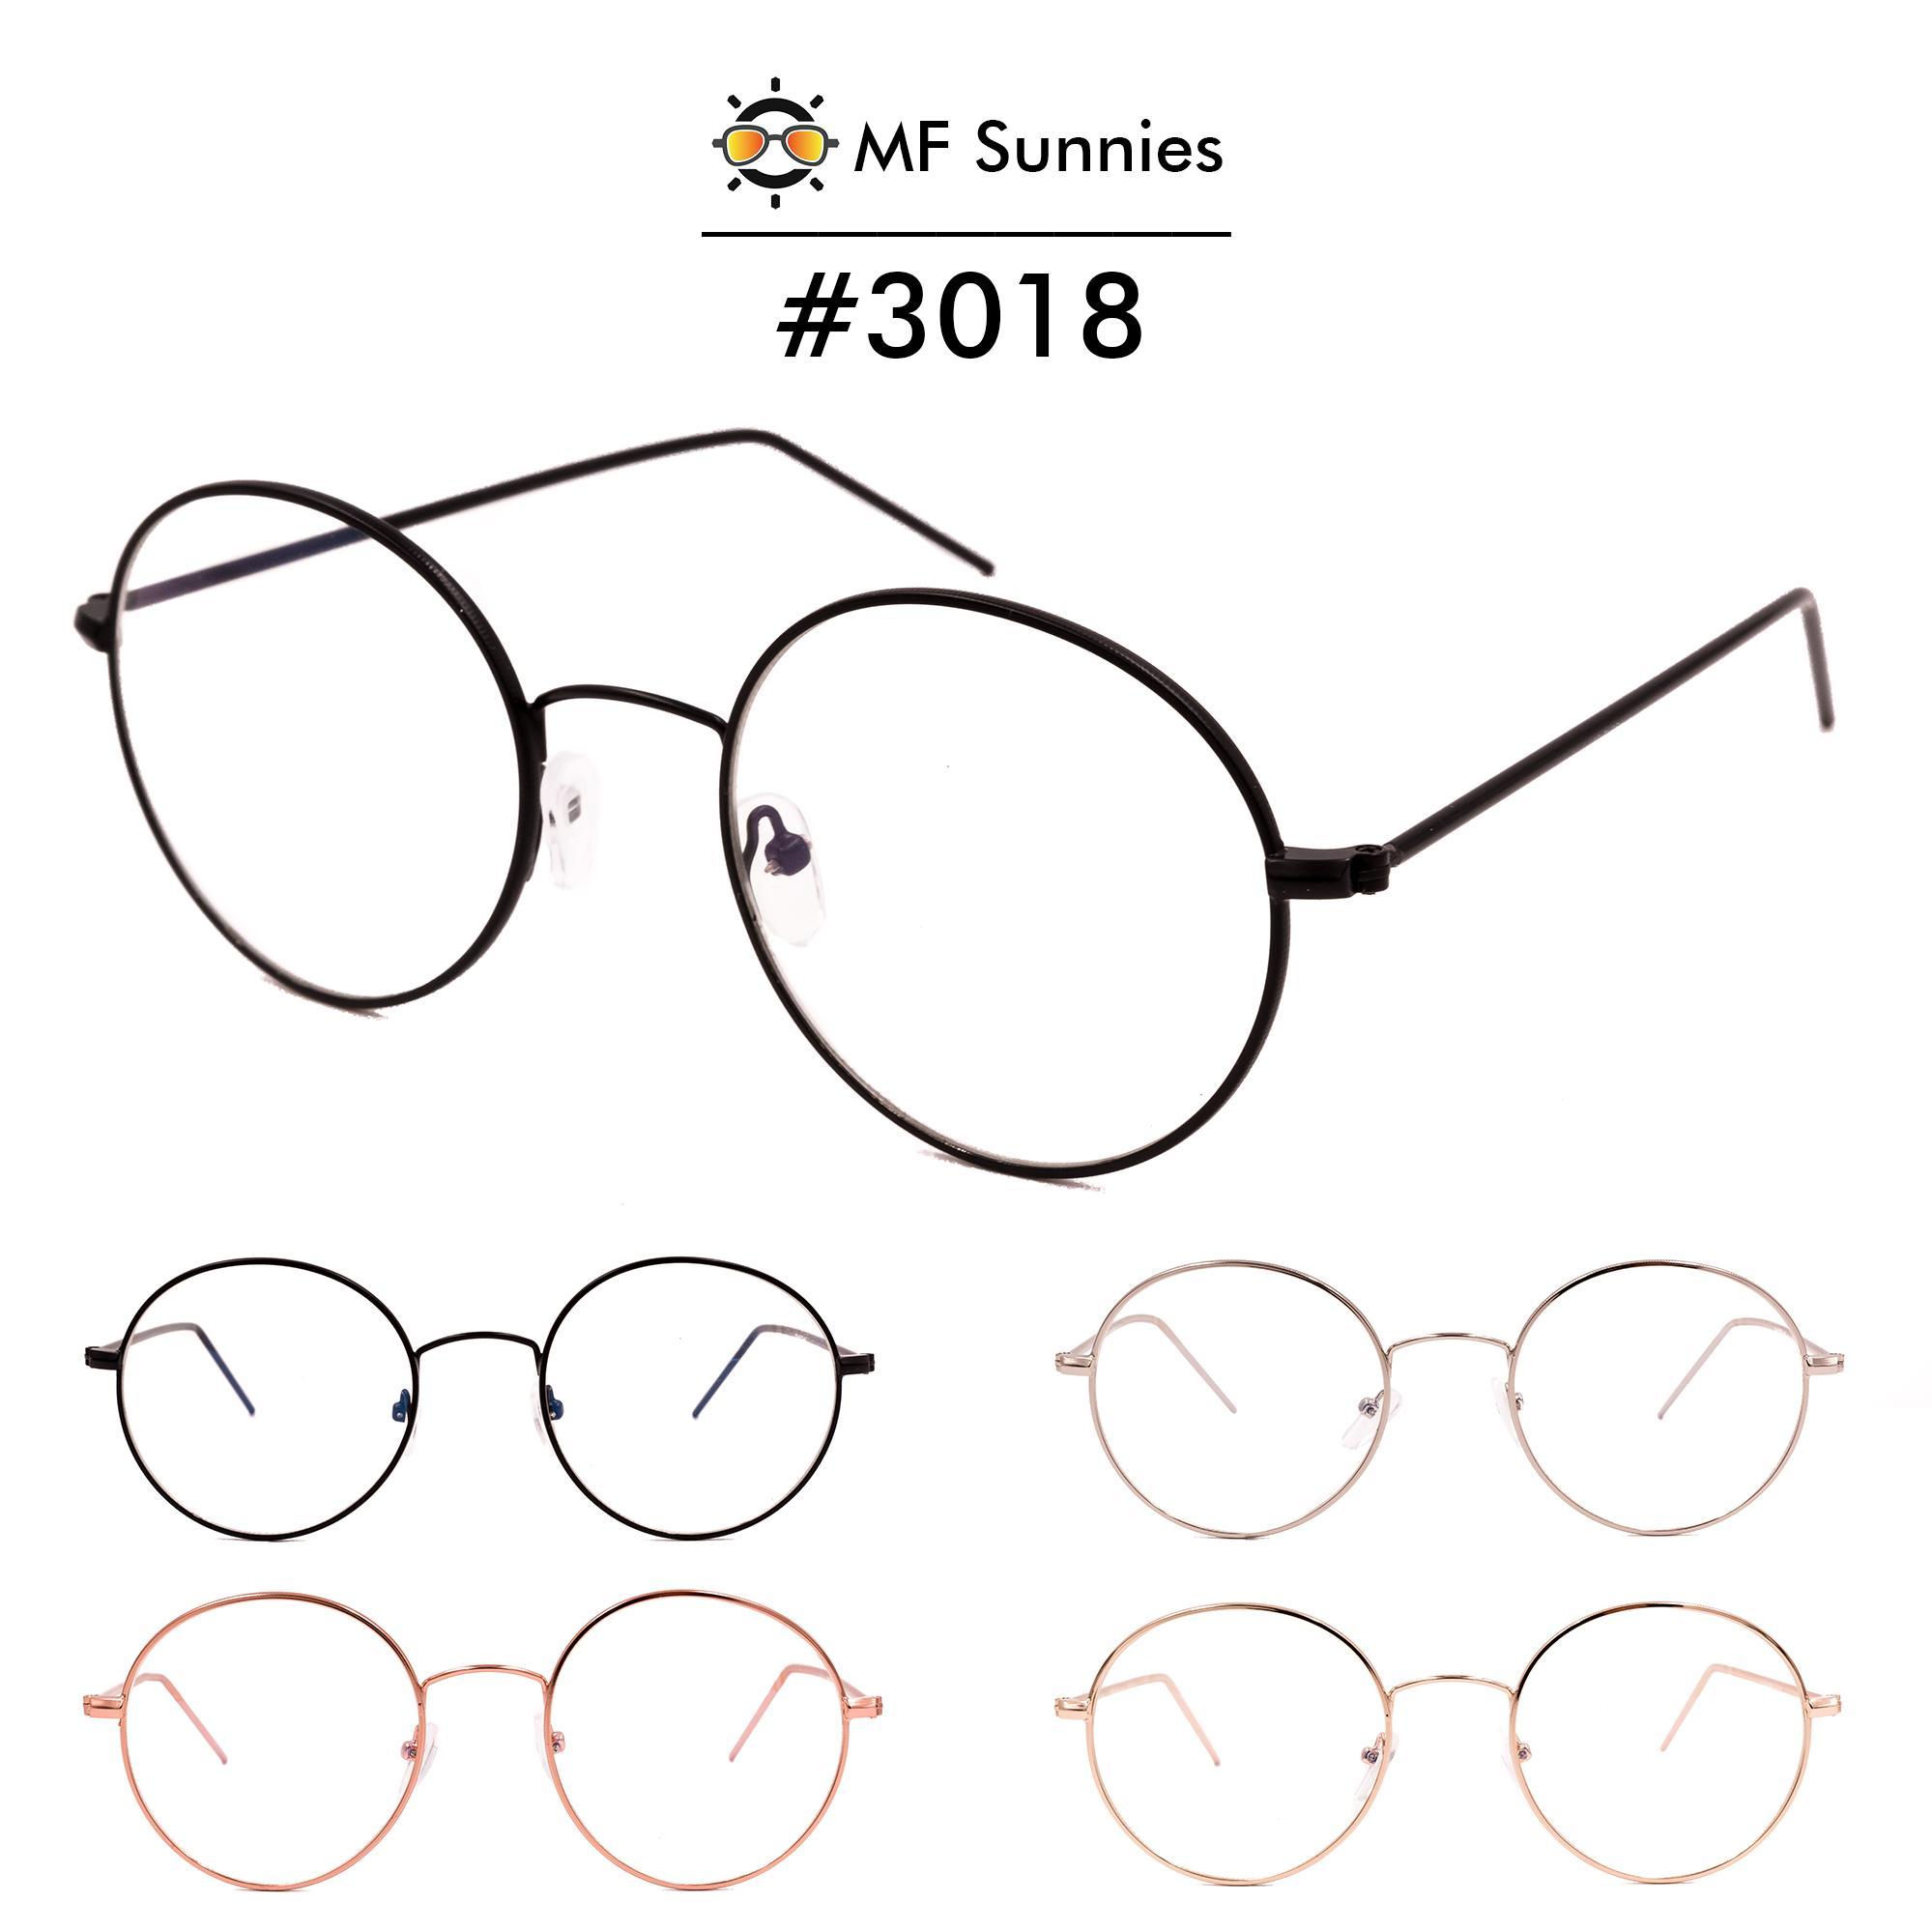 eyeglasses for women for sale womens eyeglasses online brands PWM Fan Controller Wiring to Wire a 3 mfsunnies puter anti radiation blue light replaceable full metal unisex eyeglass 3018